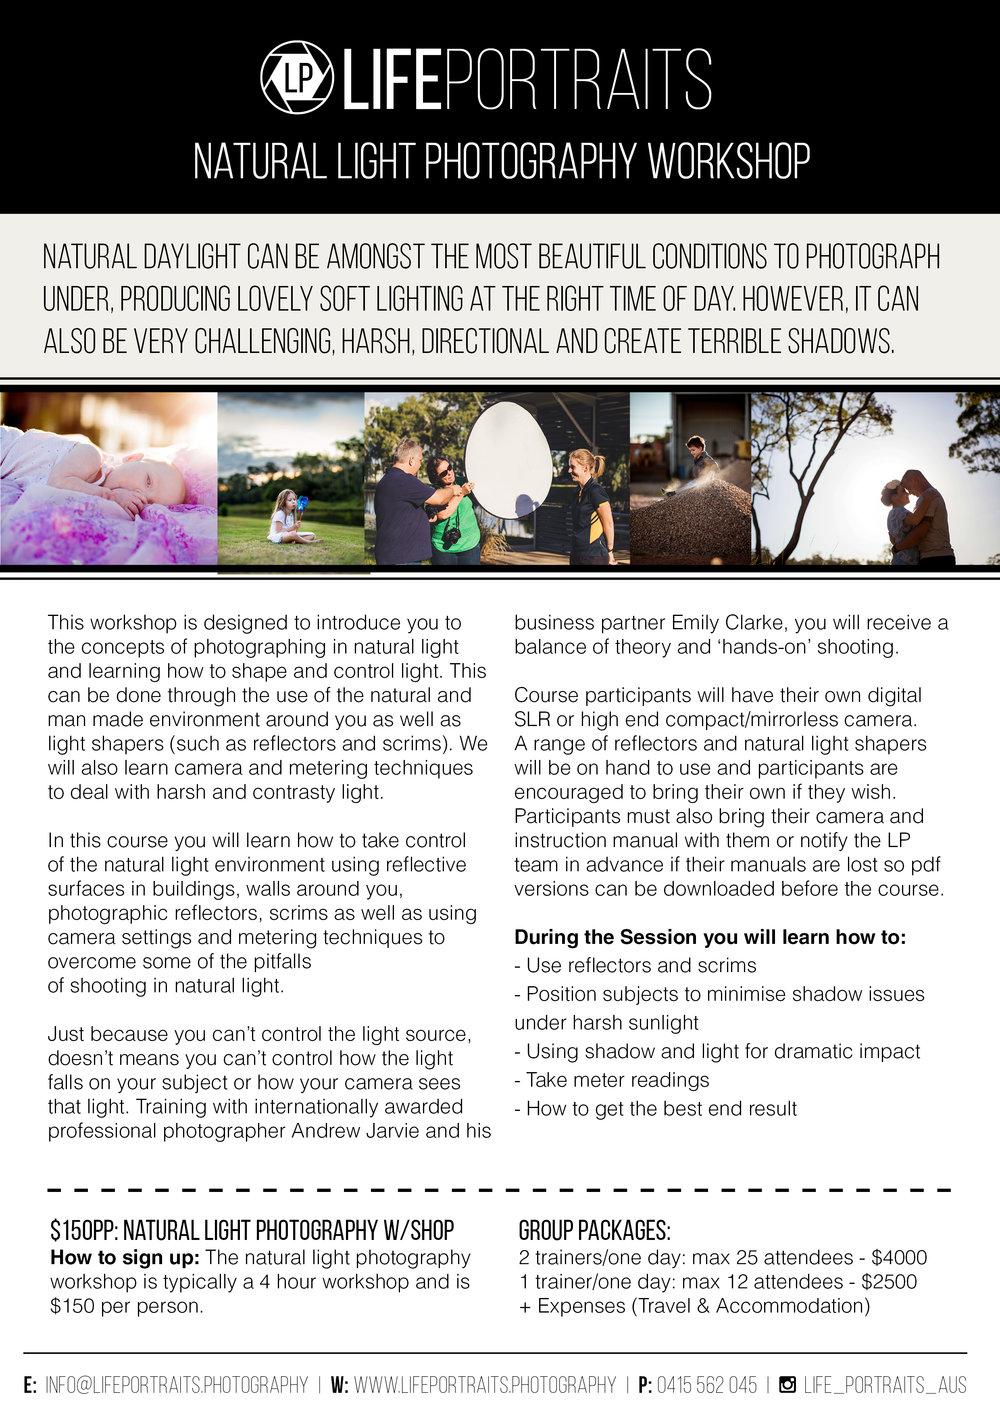 Life Portraits: Brisbane Natural Light Photography Workshop